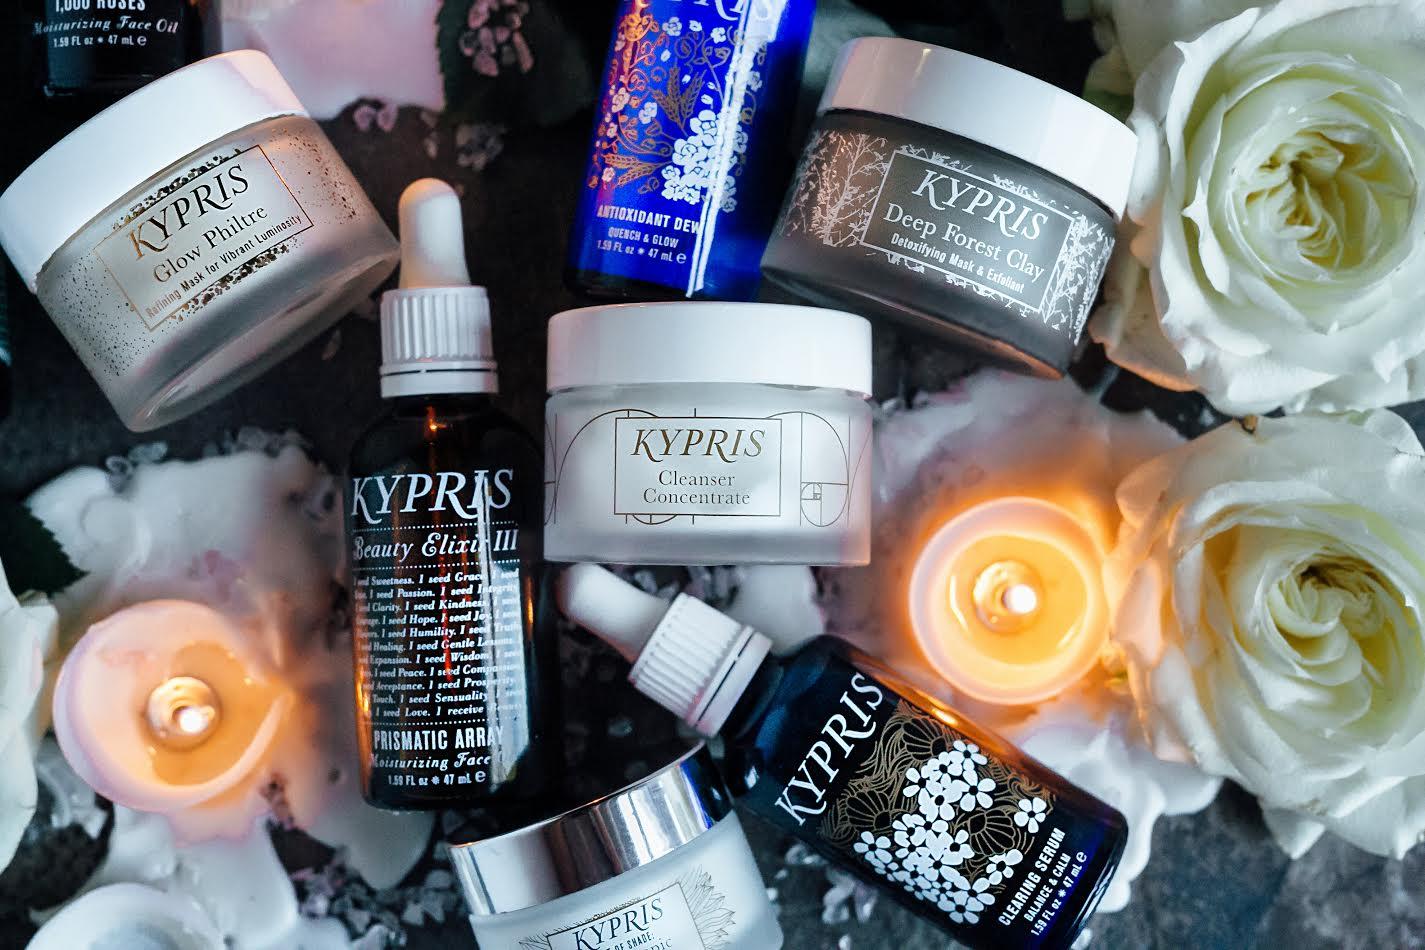 Spa Skincare and Spa Retail-Kypris-Spa Advisors, Inc. Retail Blog Post #3